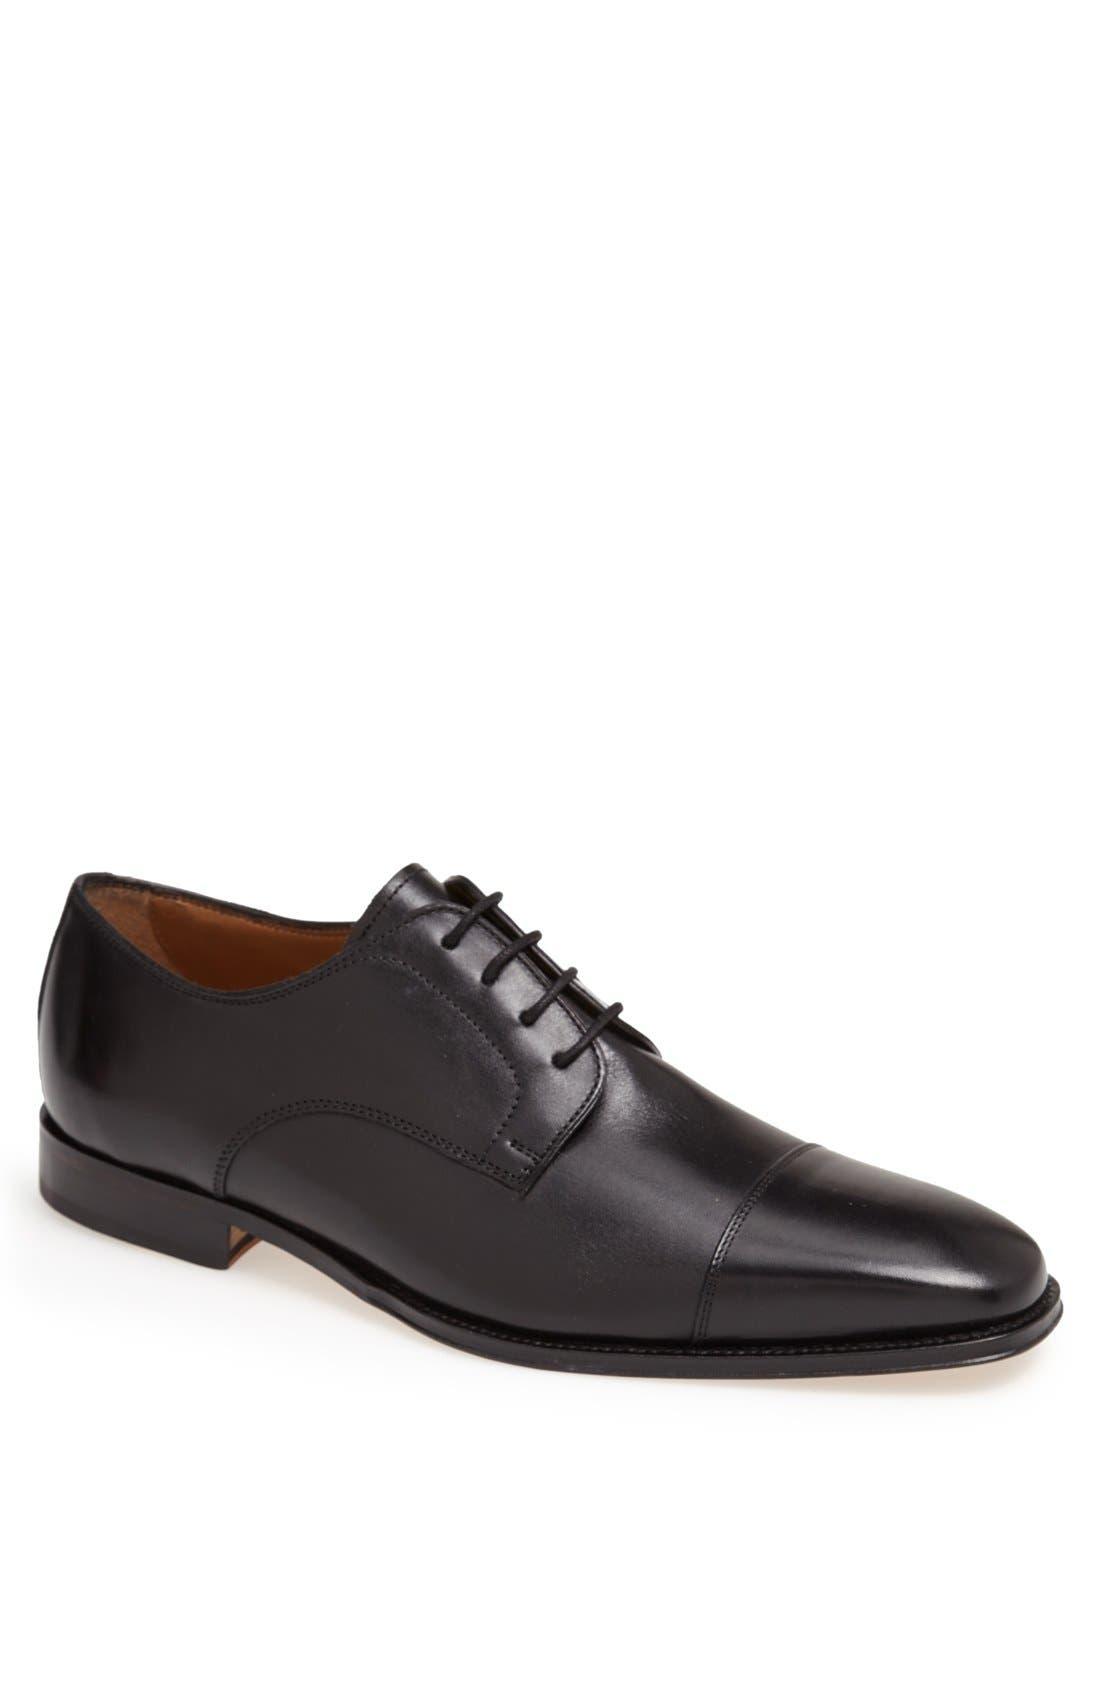 FLORSHEIM Classico Cap Toe Oxford, Main, color, BLACK